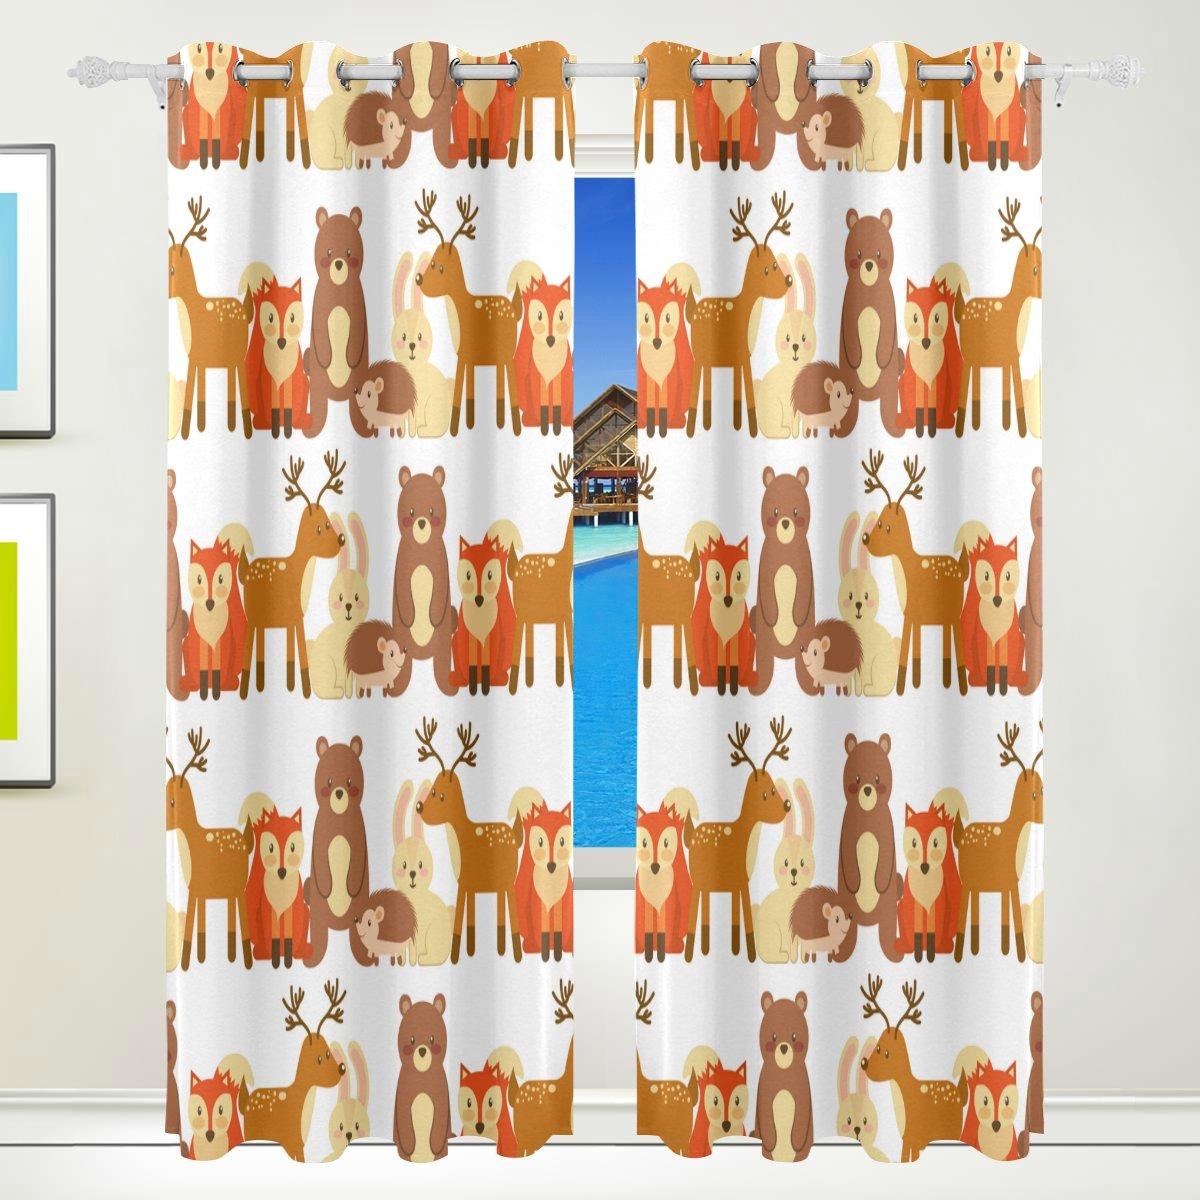 Vantaso Window Curtains 84 Inch Long Forest Animal Deer Fox Bear for Kids Girls Boys Bedroom Living Room Polyester 2 Pannels